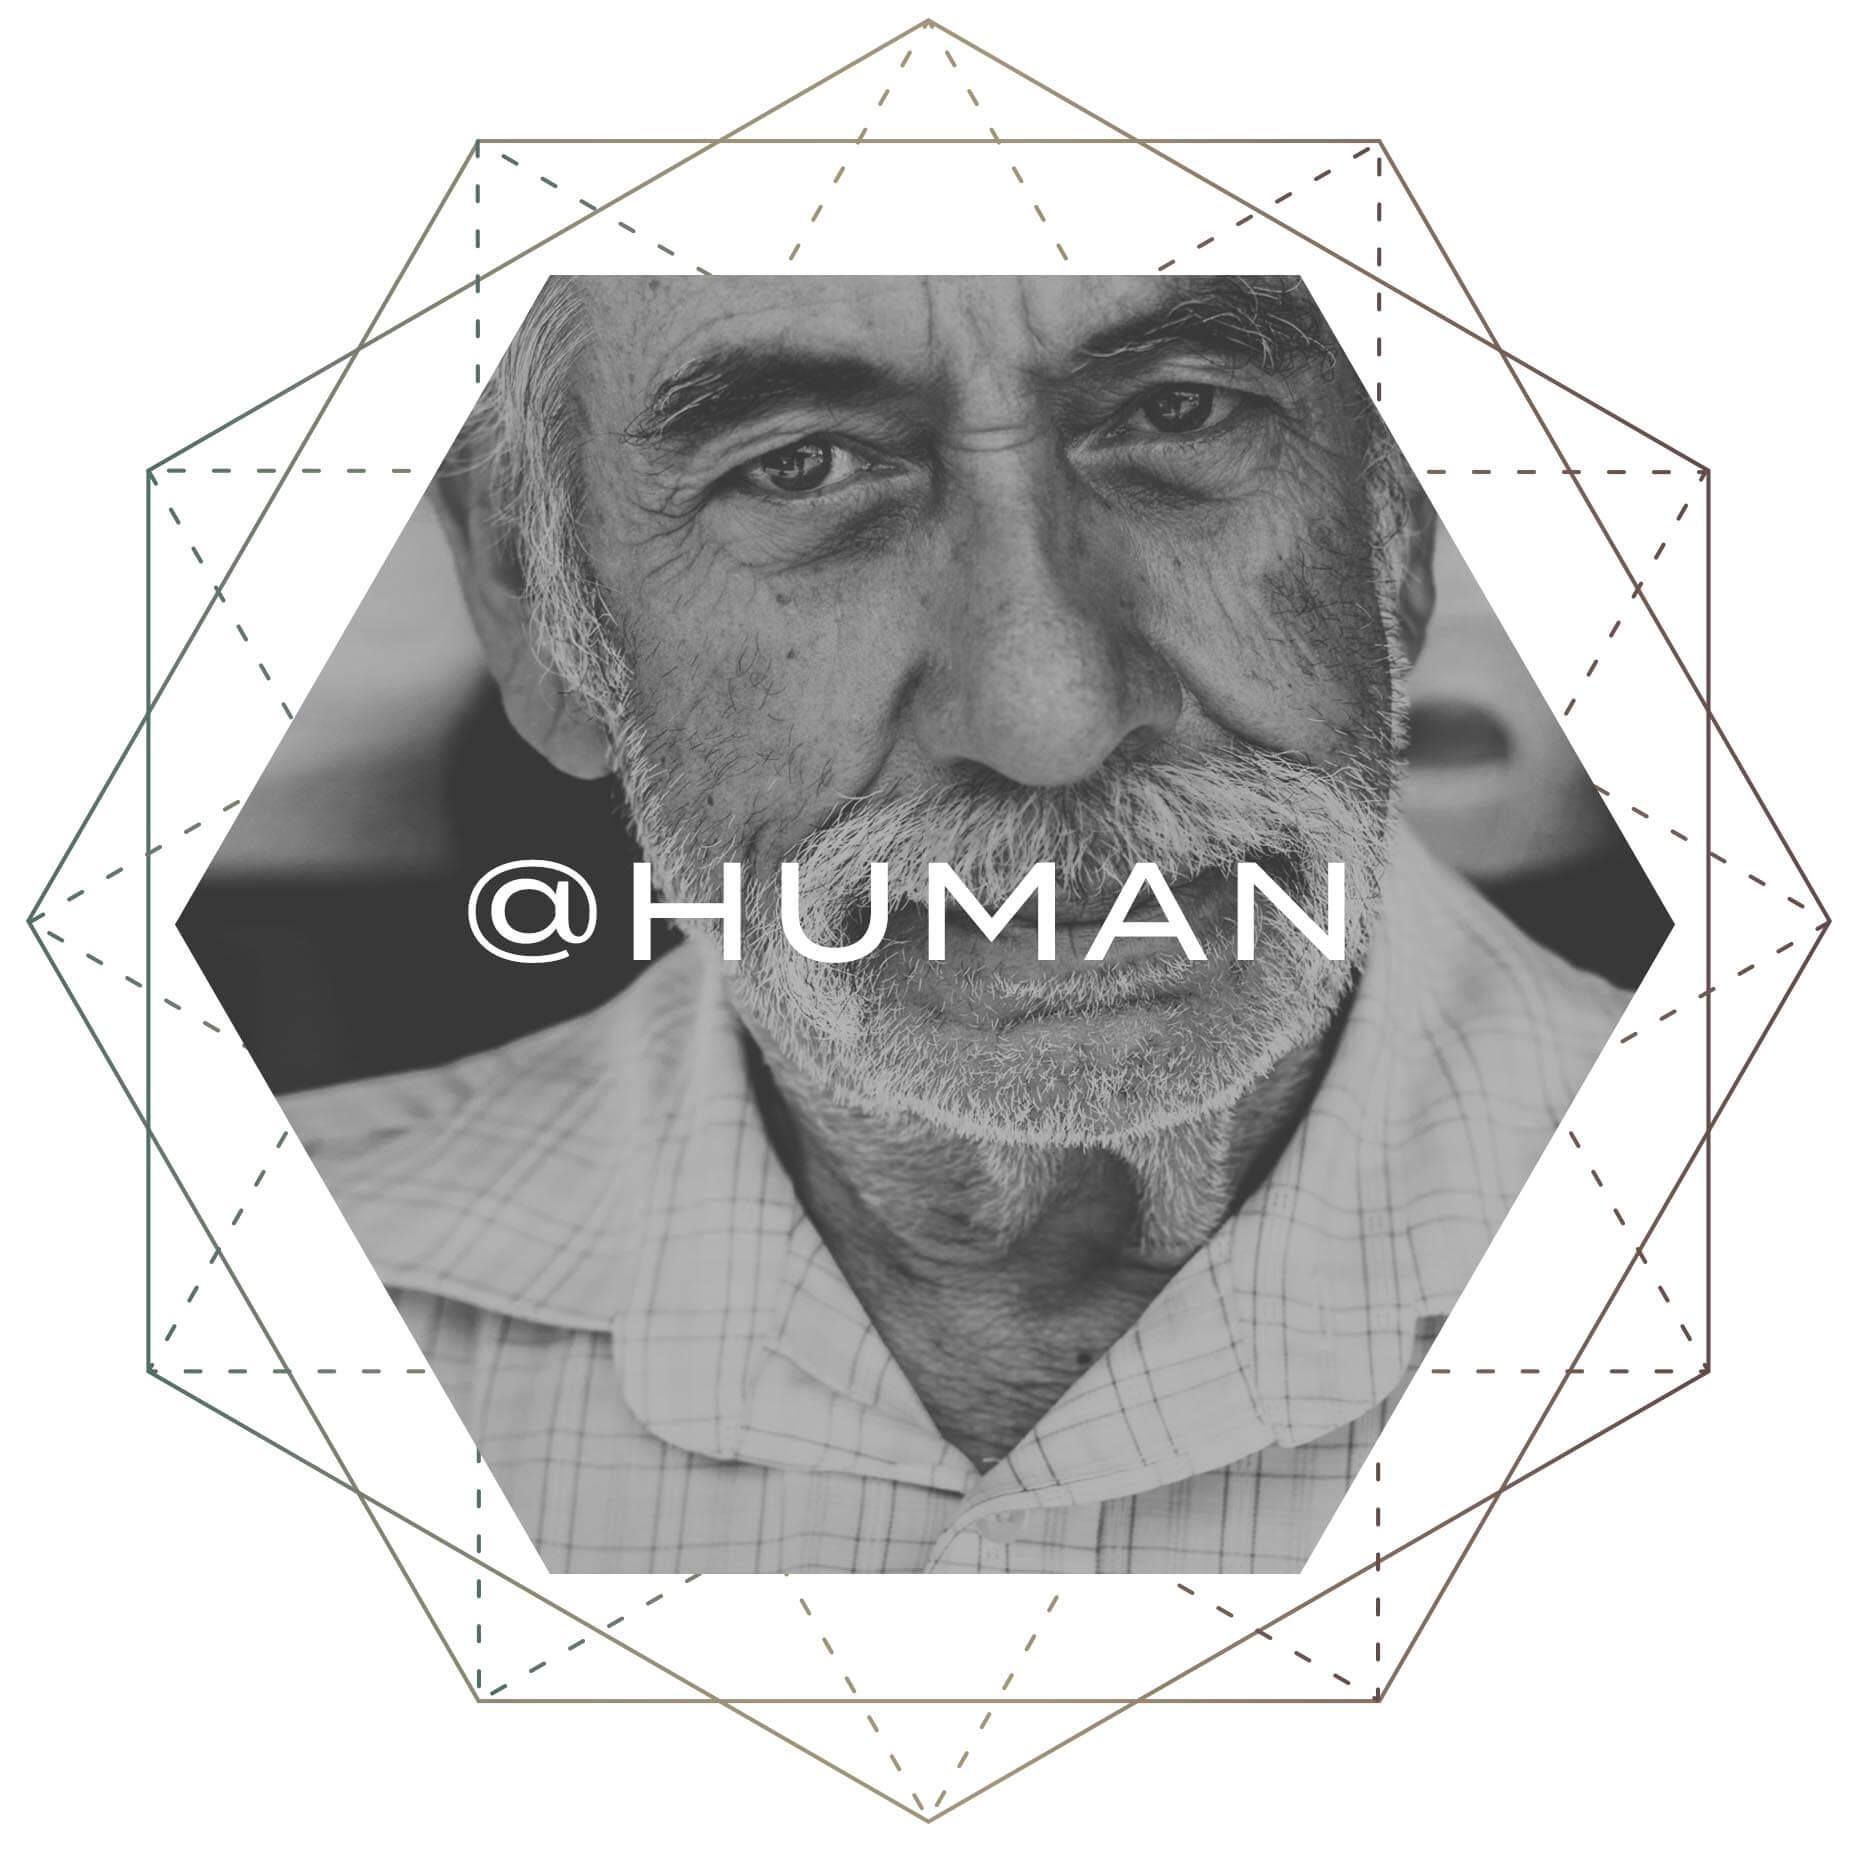 Humans-2-1